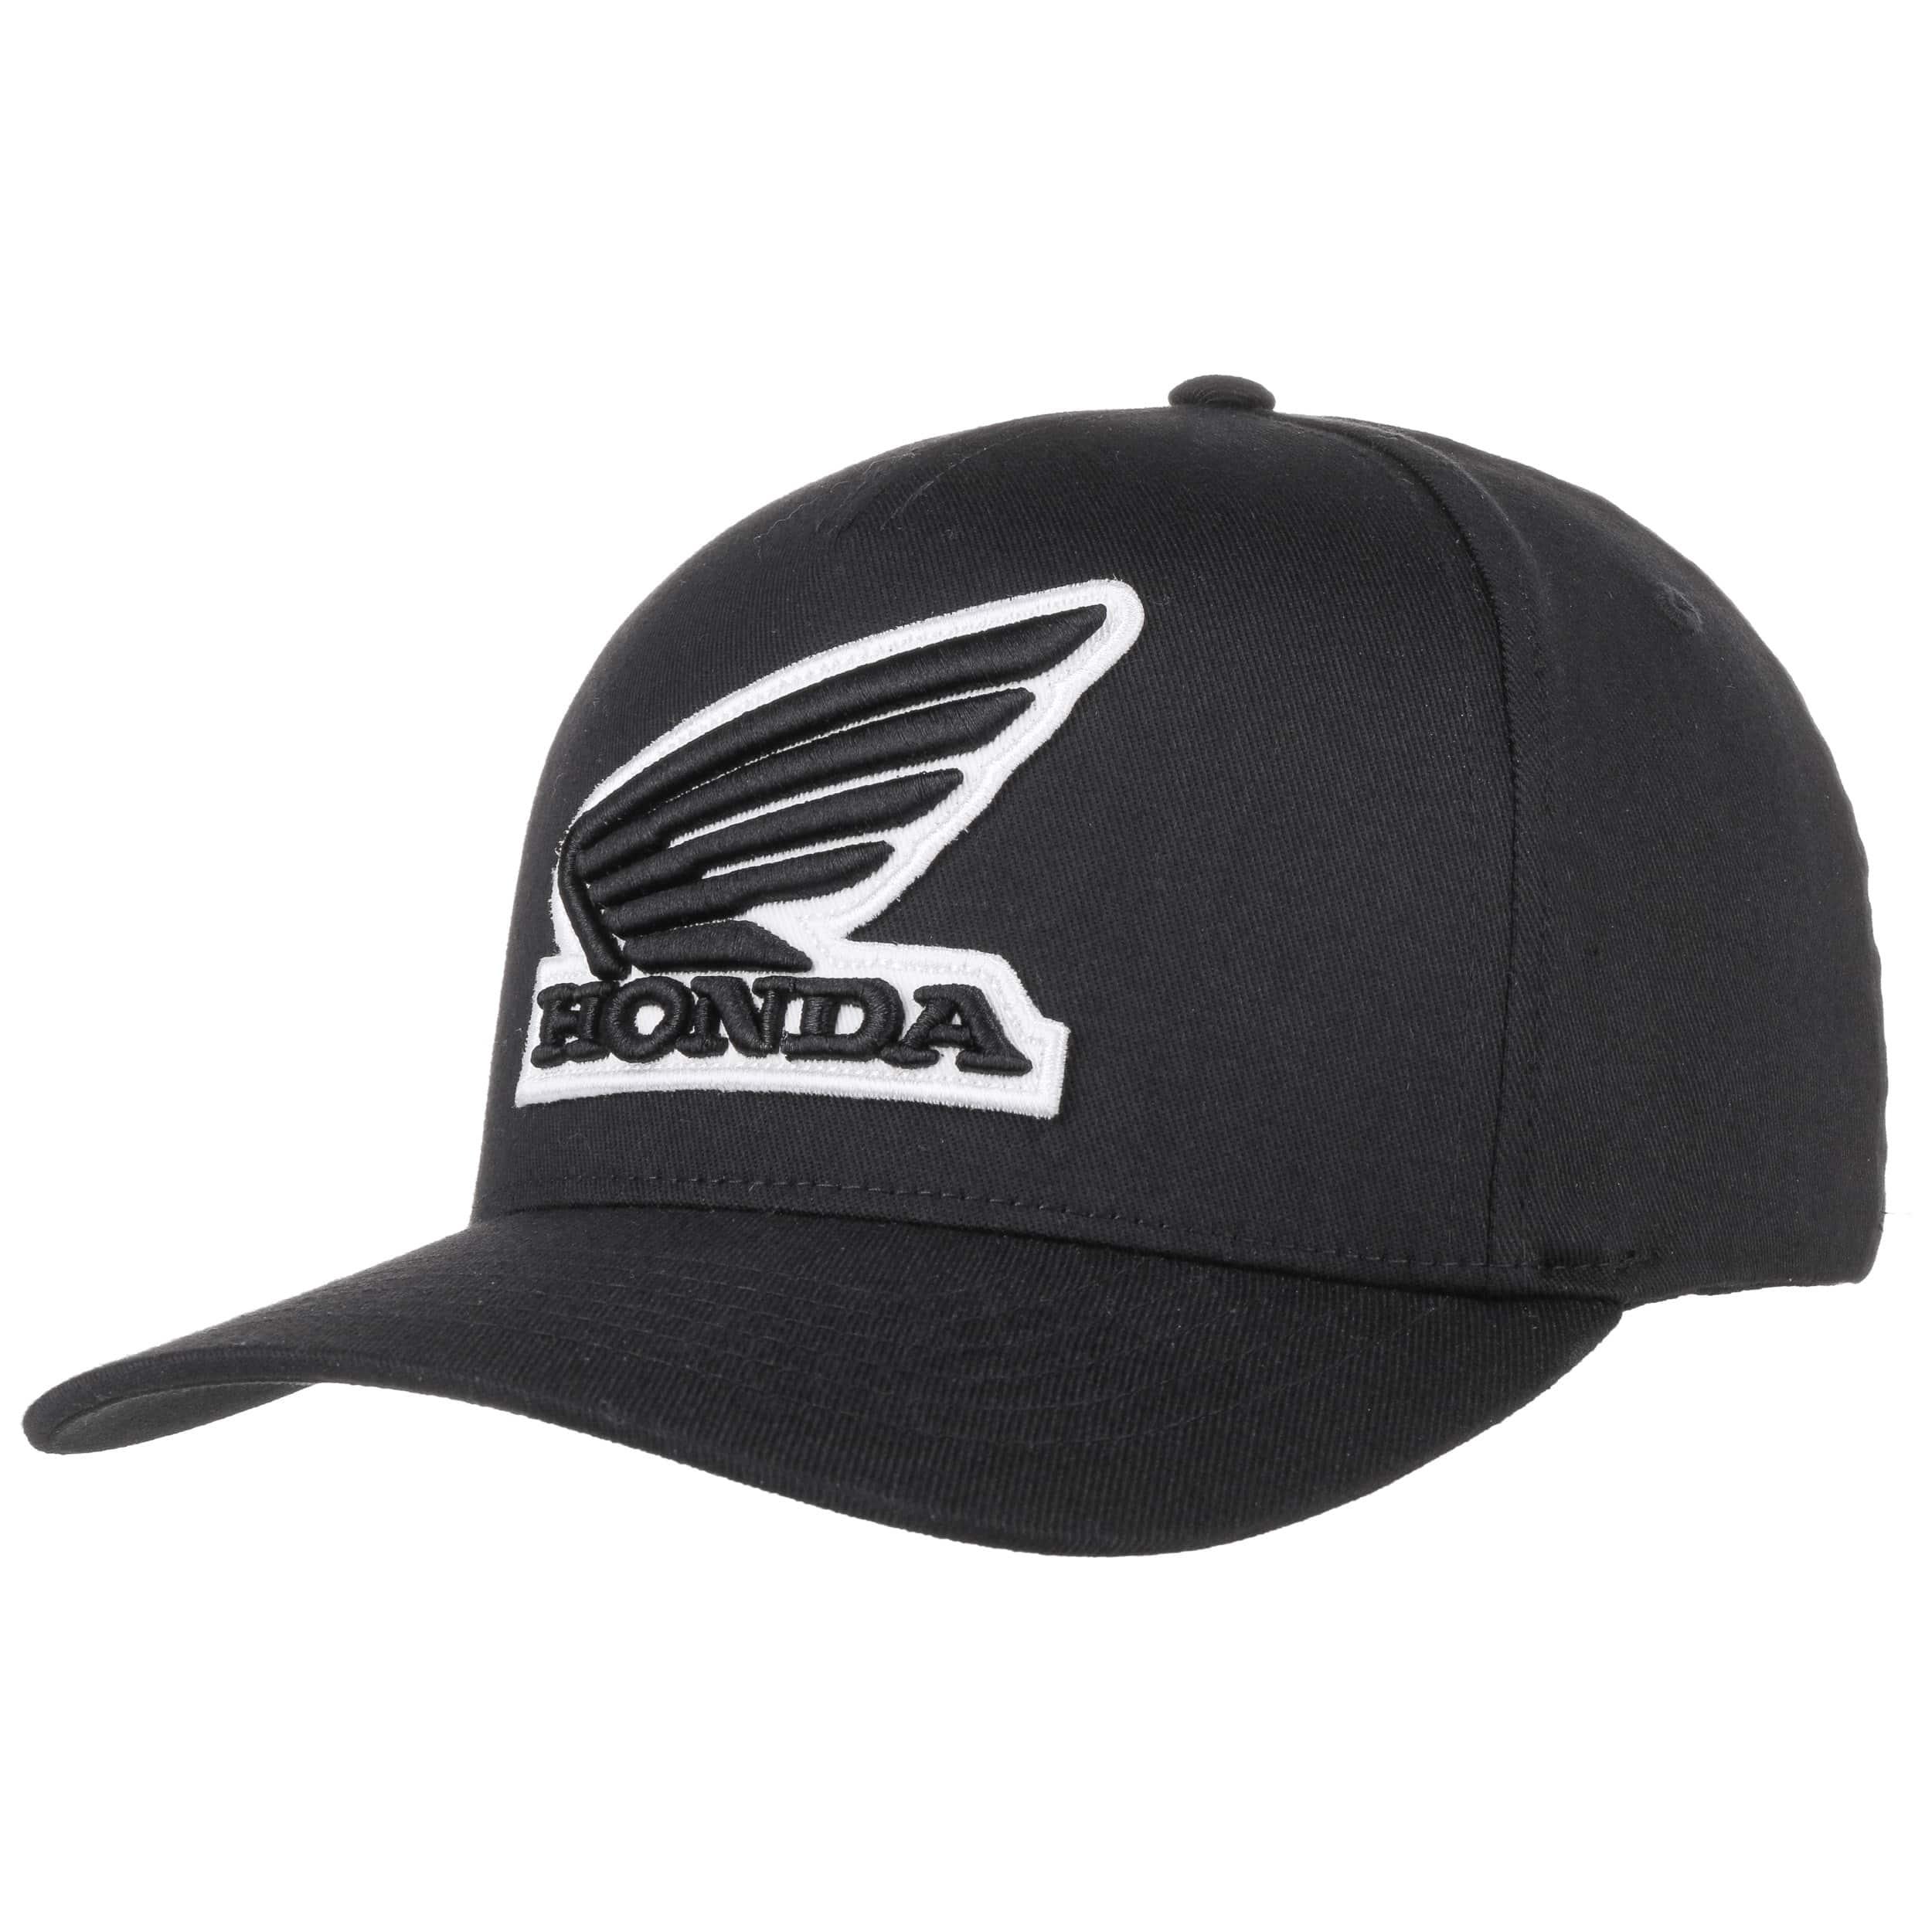 e89ee27330410 ... Honda Flexfit Cap by FOX - black 7